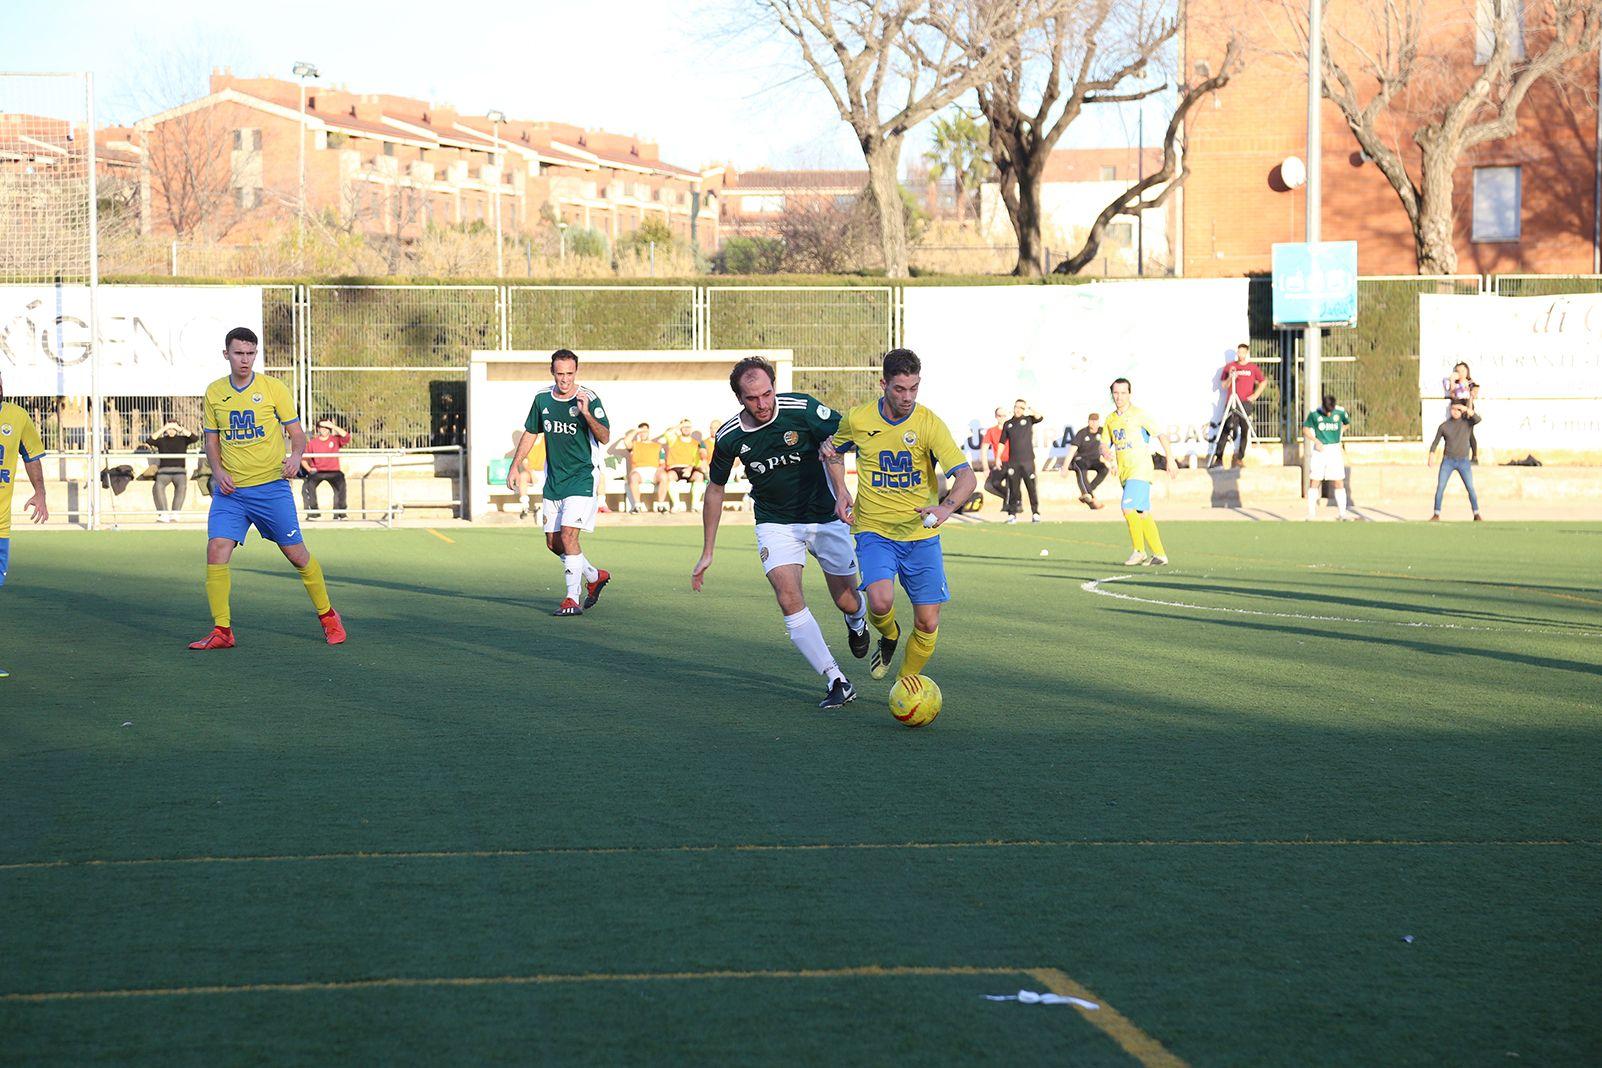 Partit de lliga Valldoreic FC-UD San Mauro. FOTO: Anna Bassa